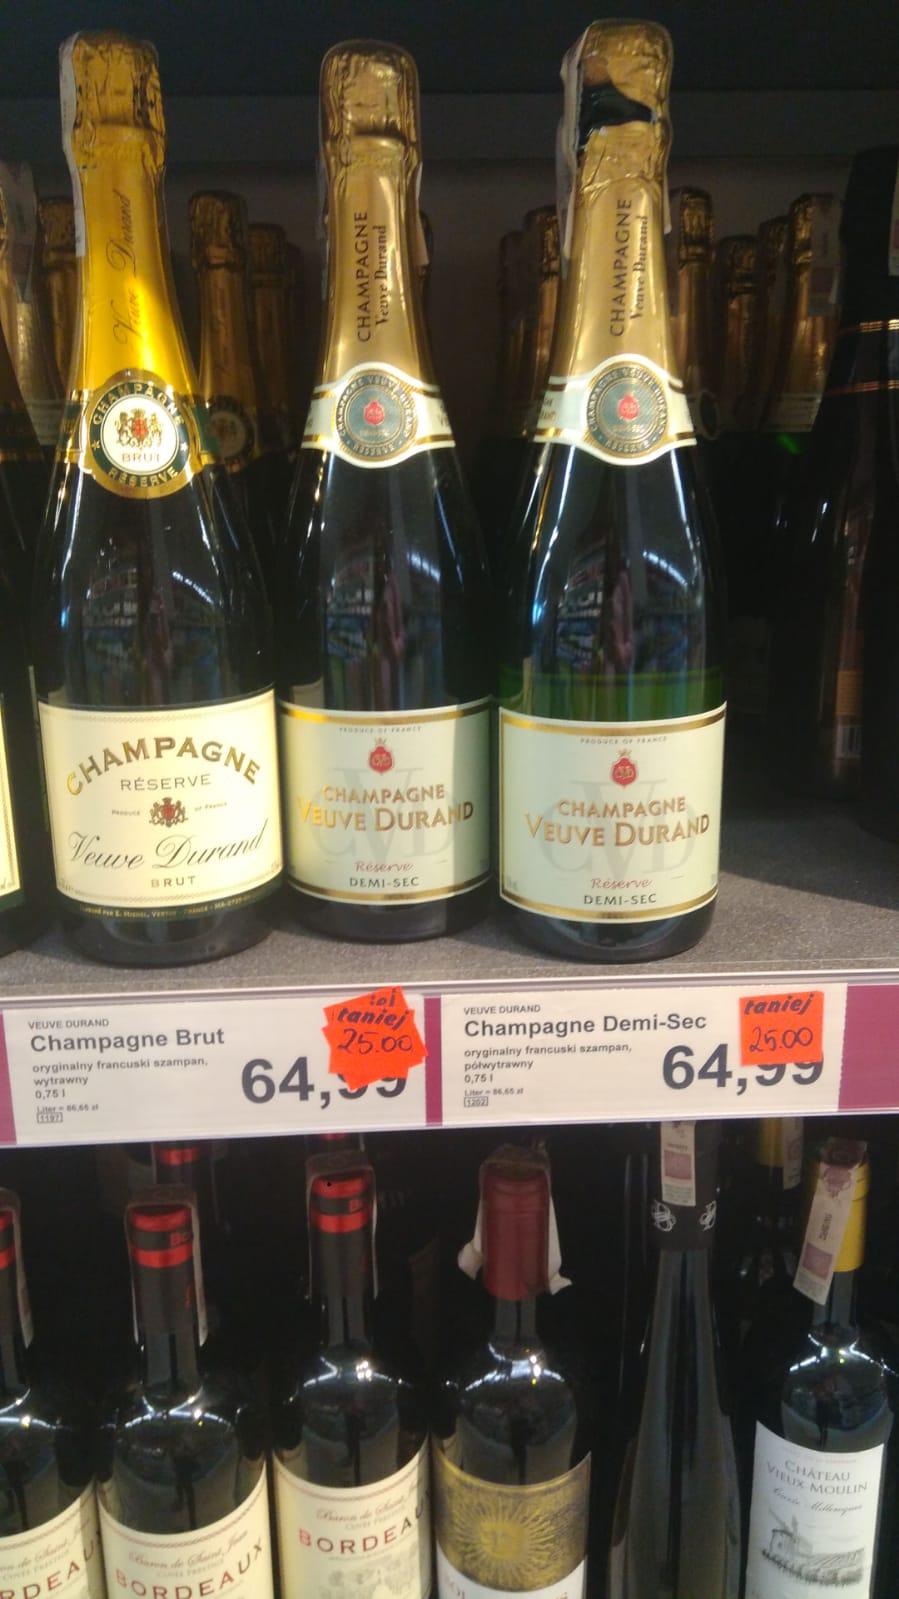 Aldi - oryginalny francuski Champagne Brut/Demi-Sec